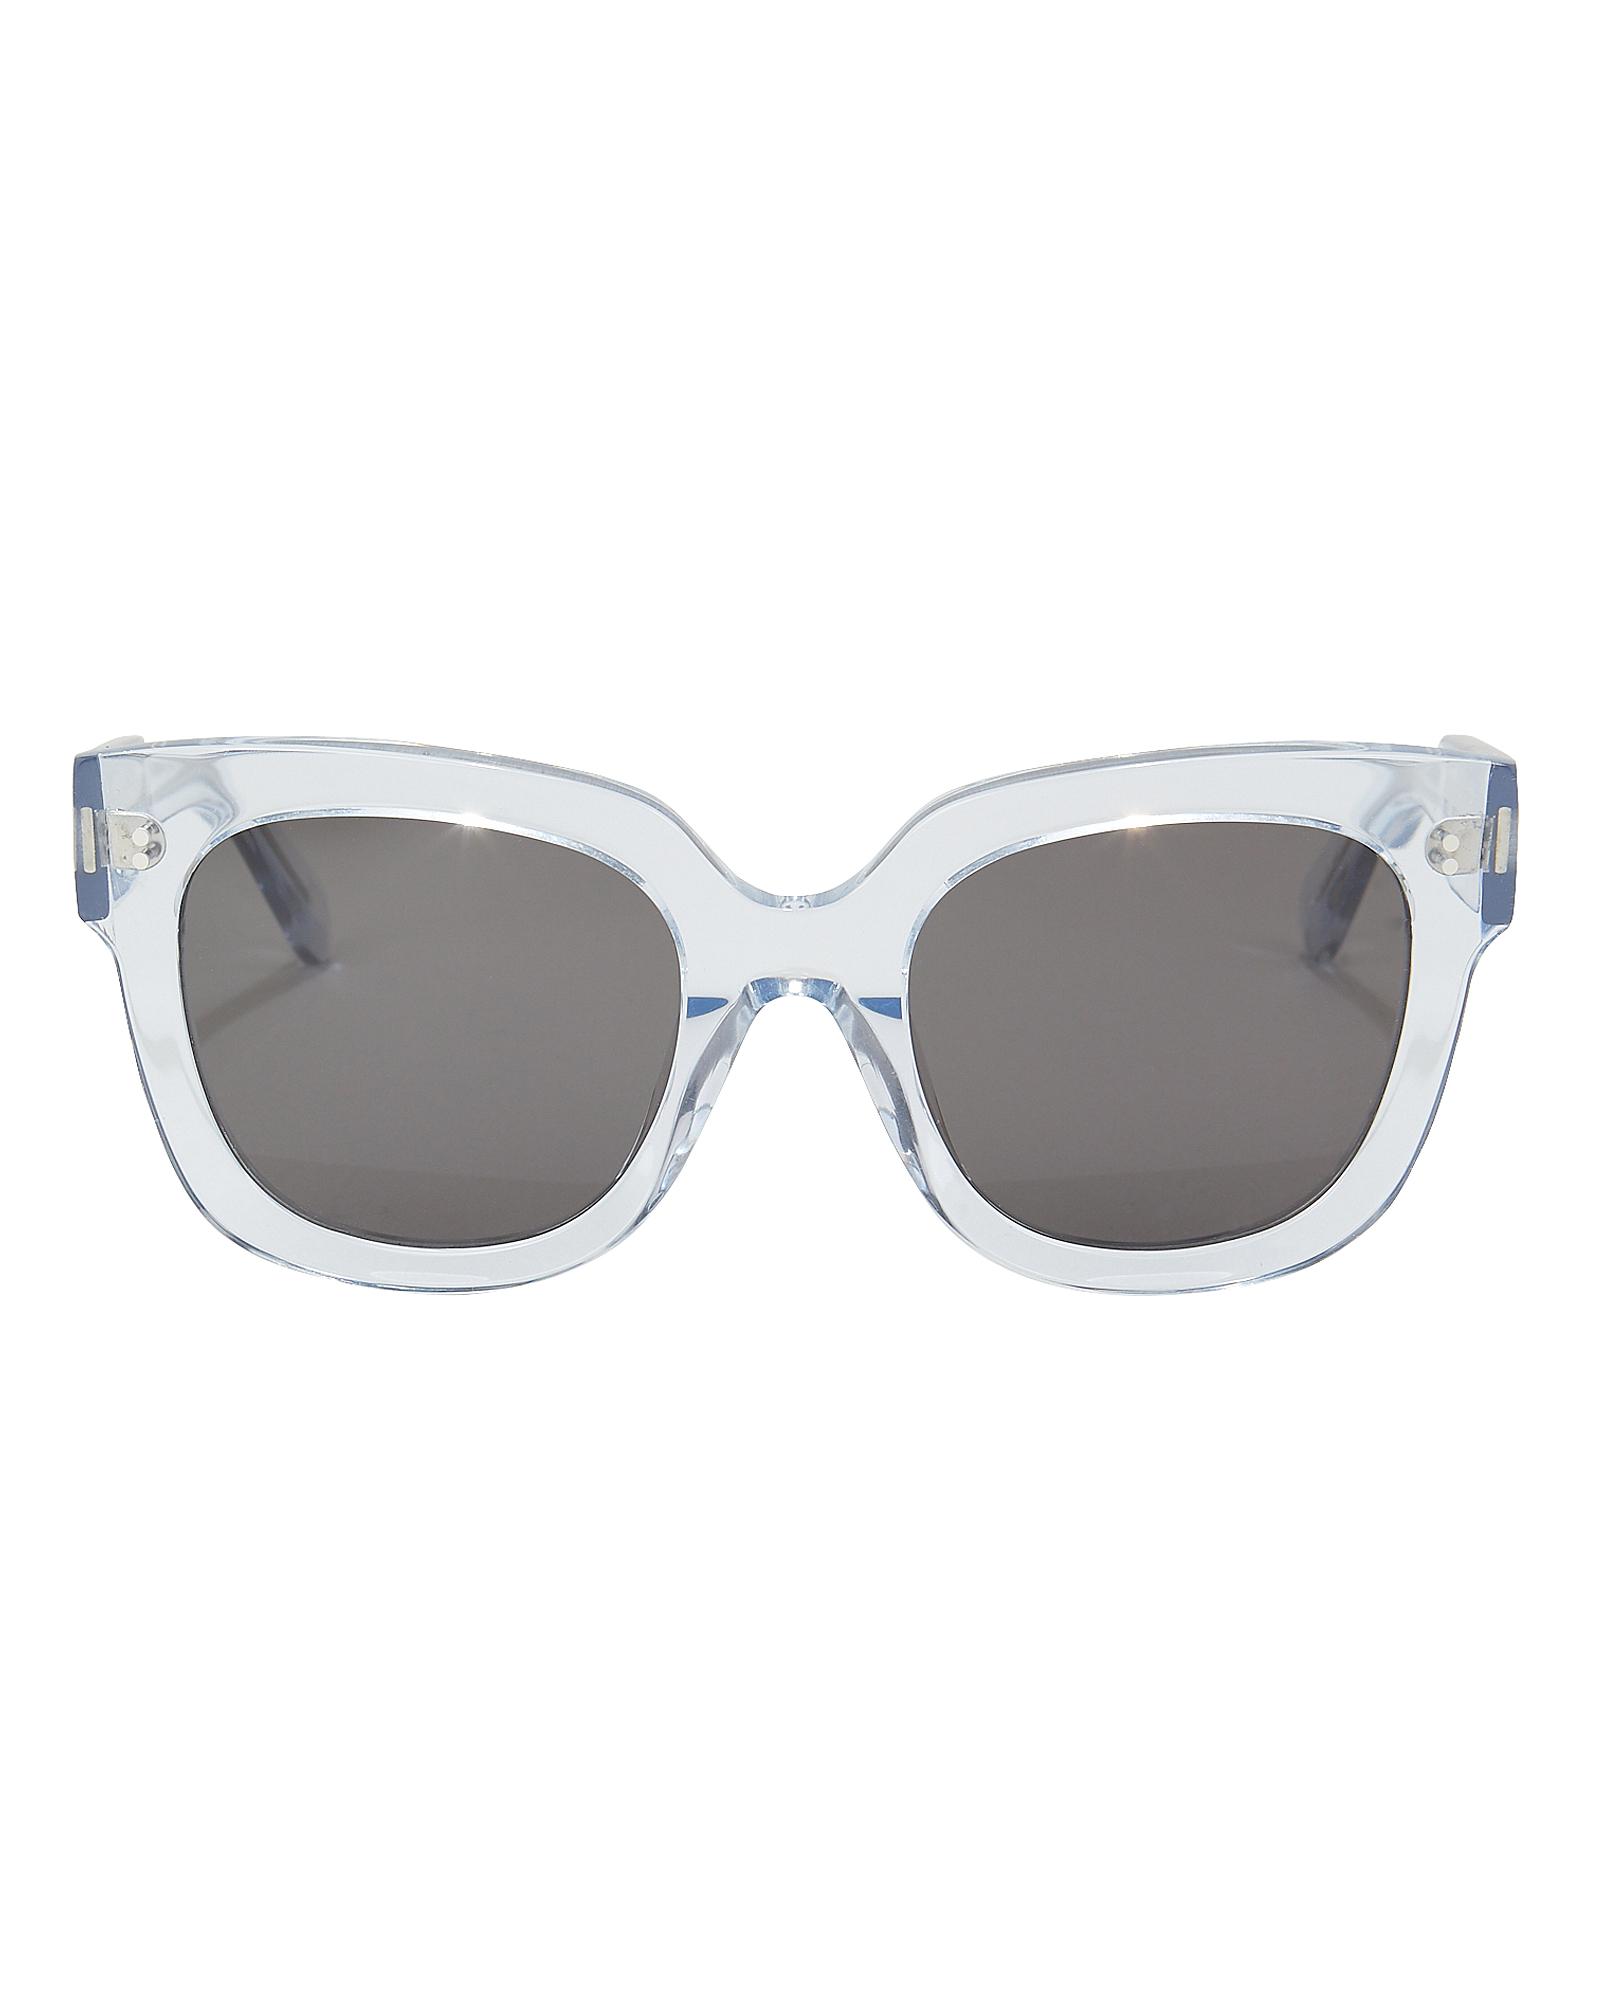 CHIMI EYEWEAR 088 Litchi Sunglasses